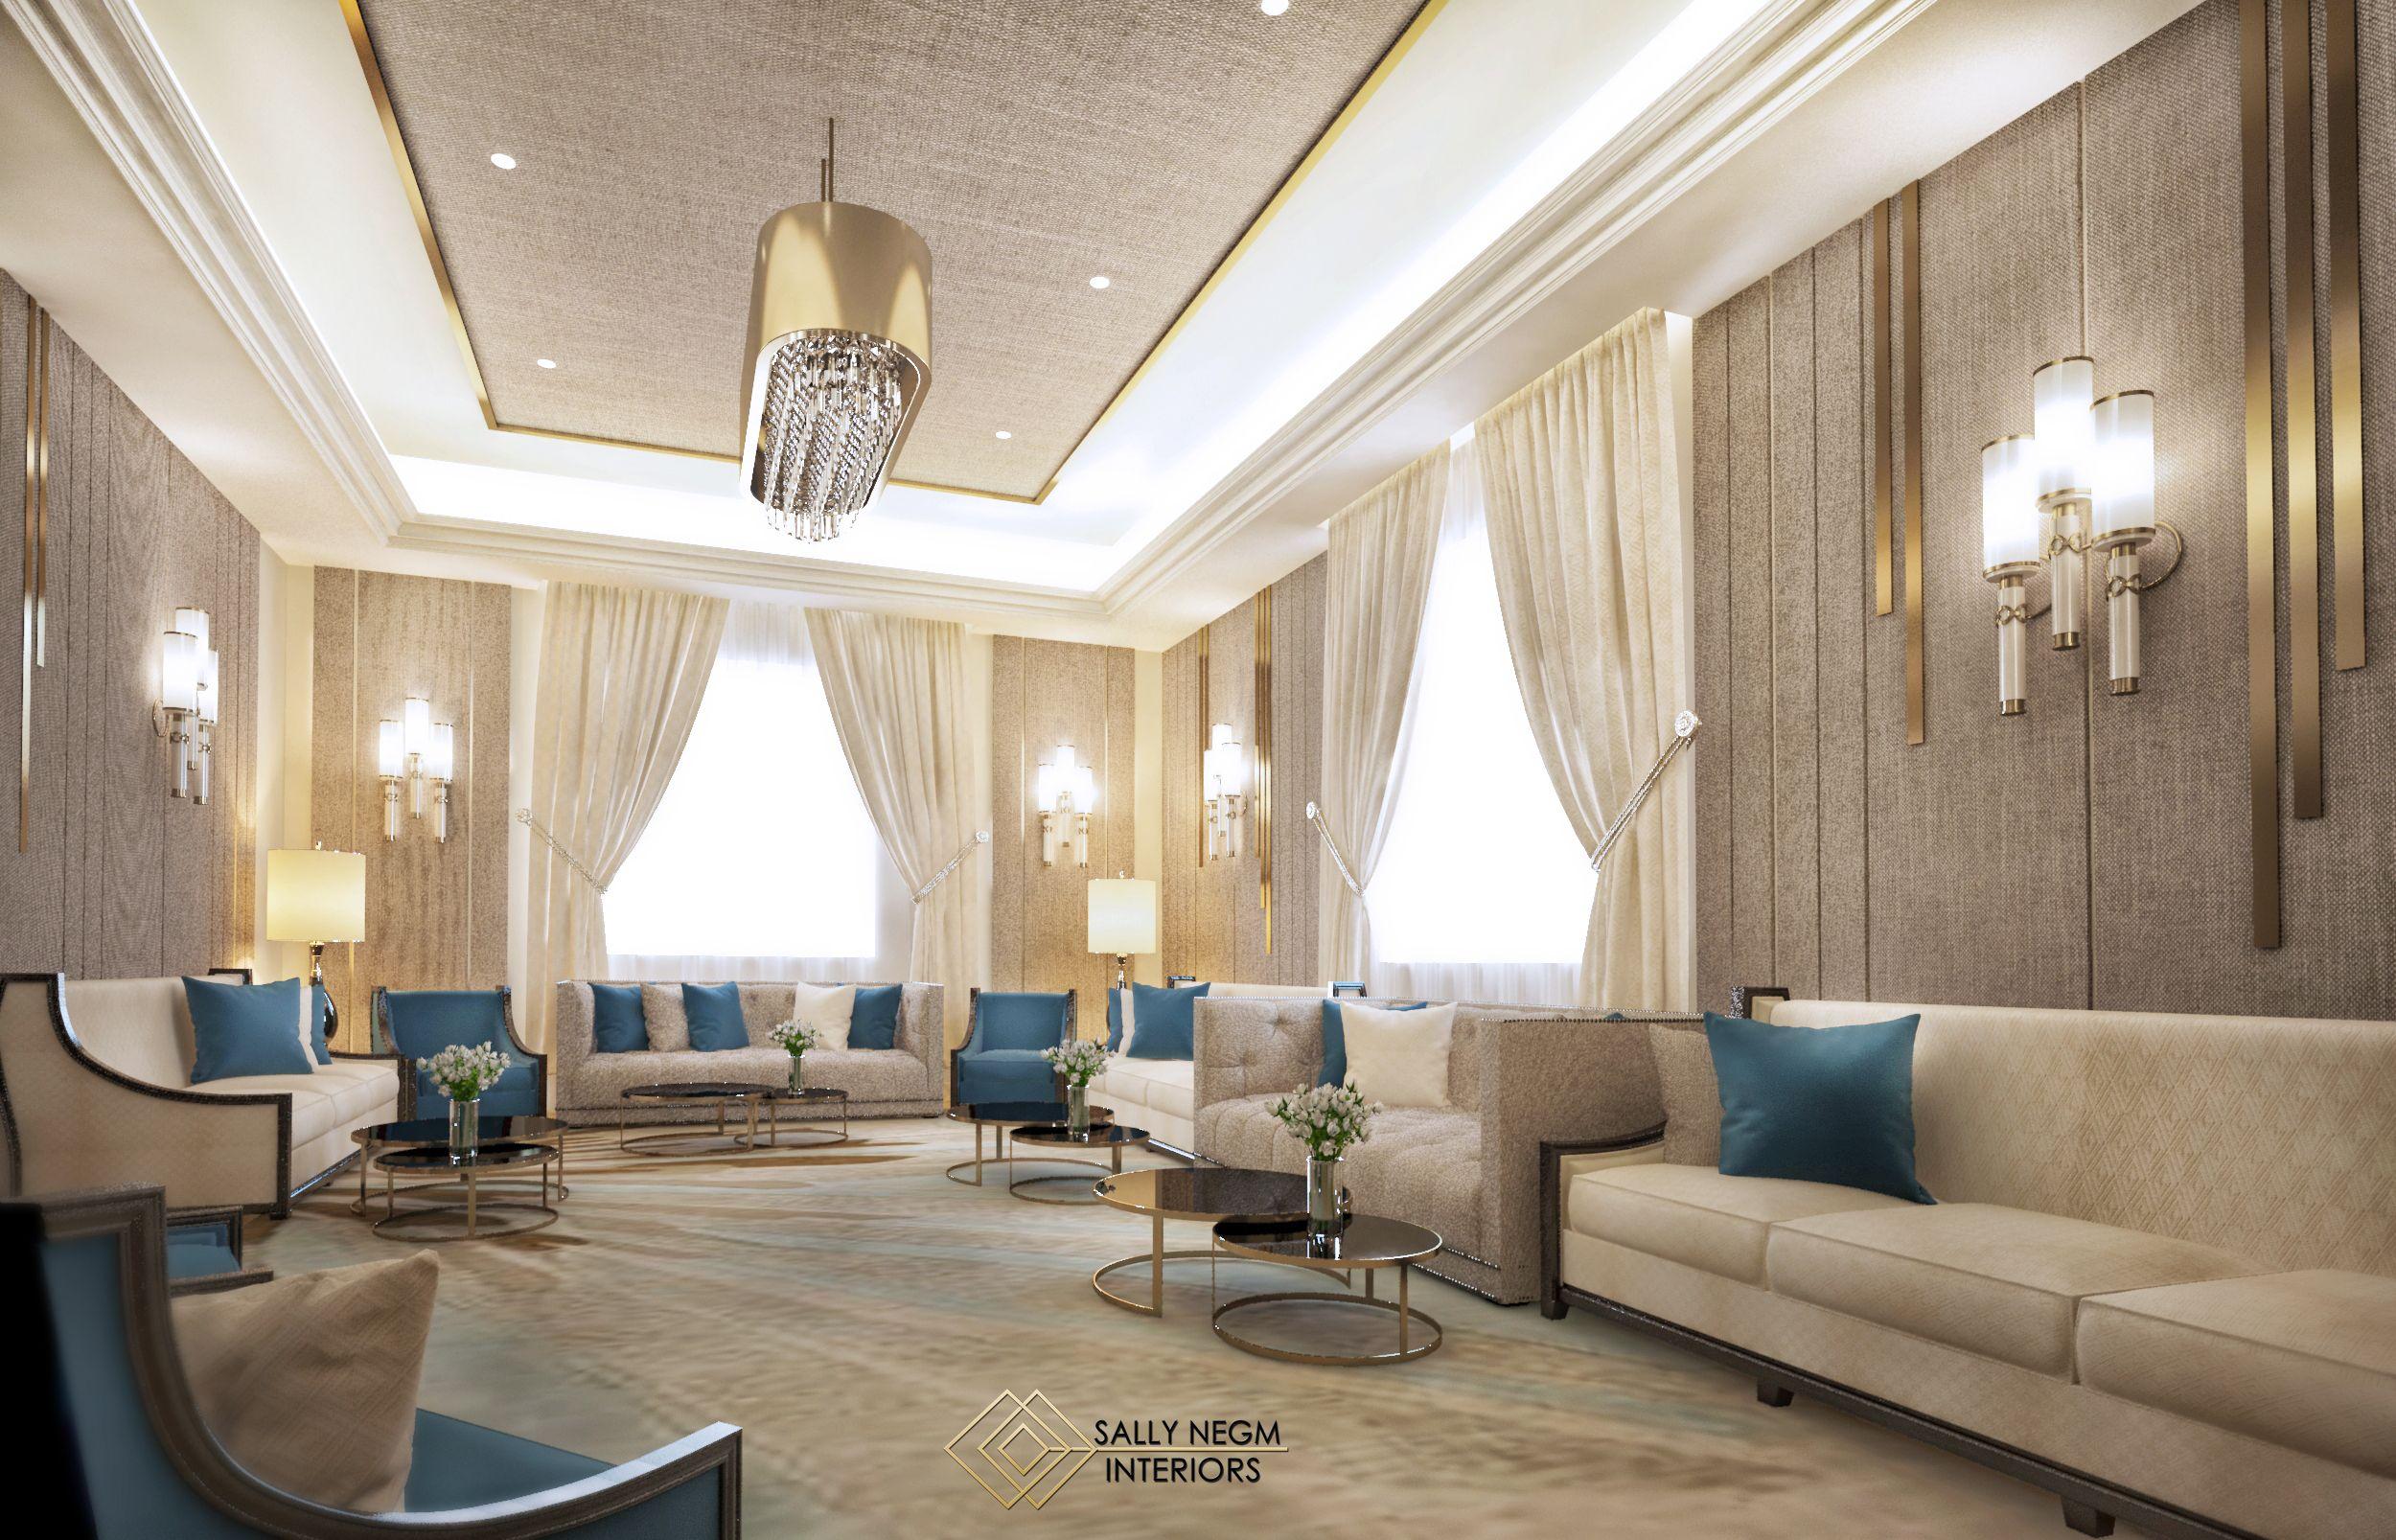 Men majlis interior design in a luxury modern style #luxury #modern ...